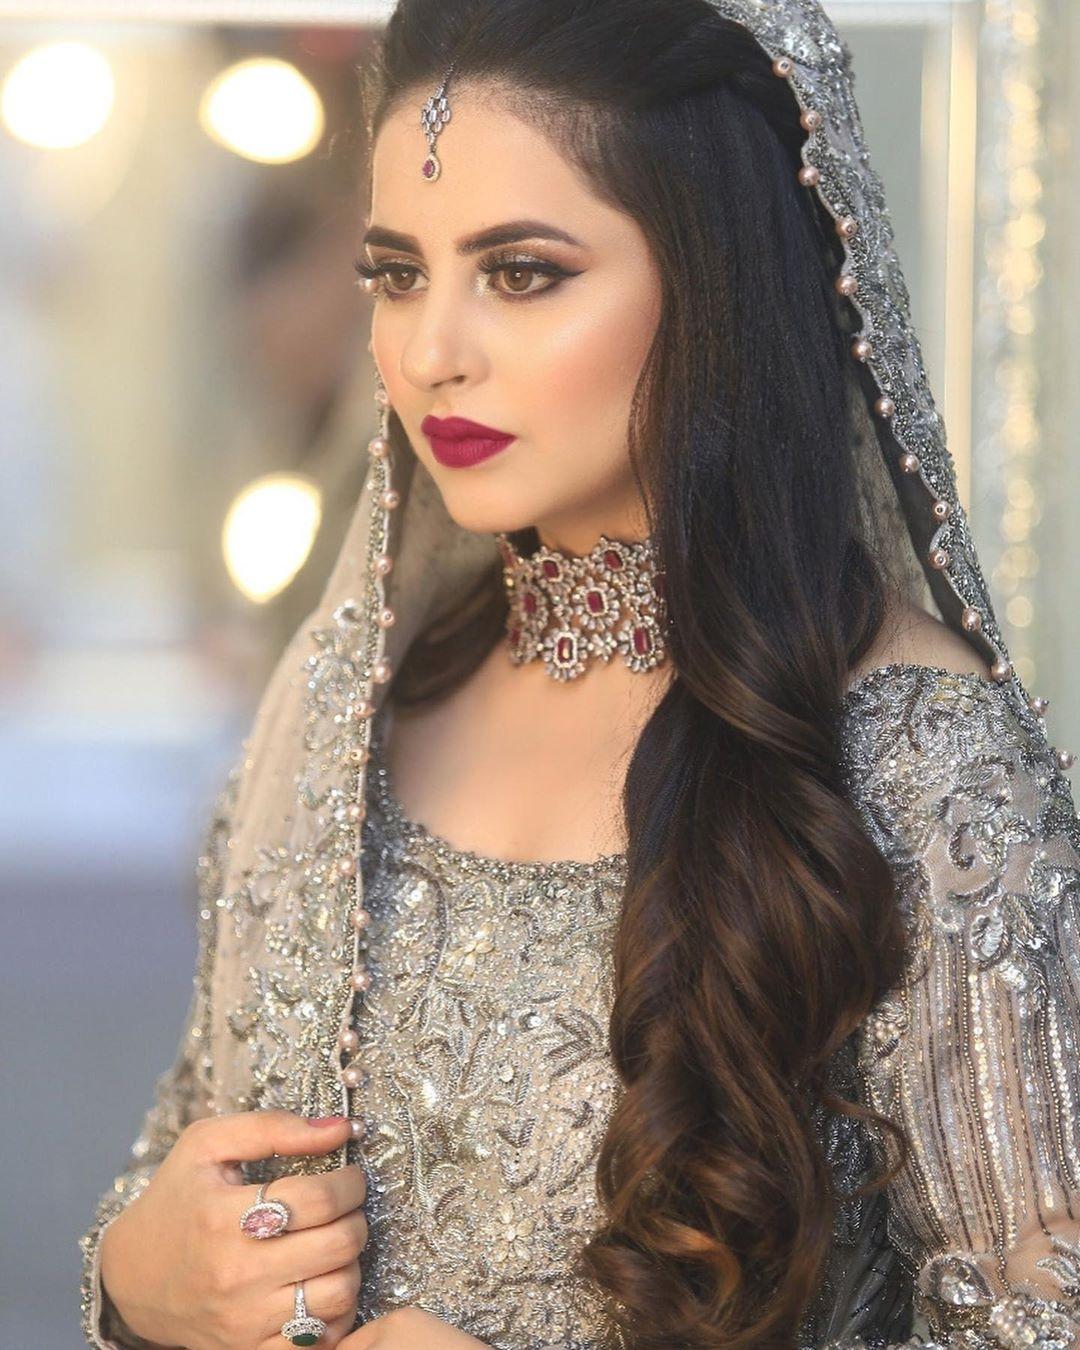 Fatima Effendi 7